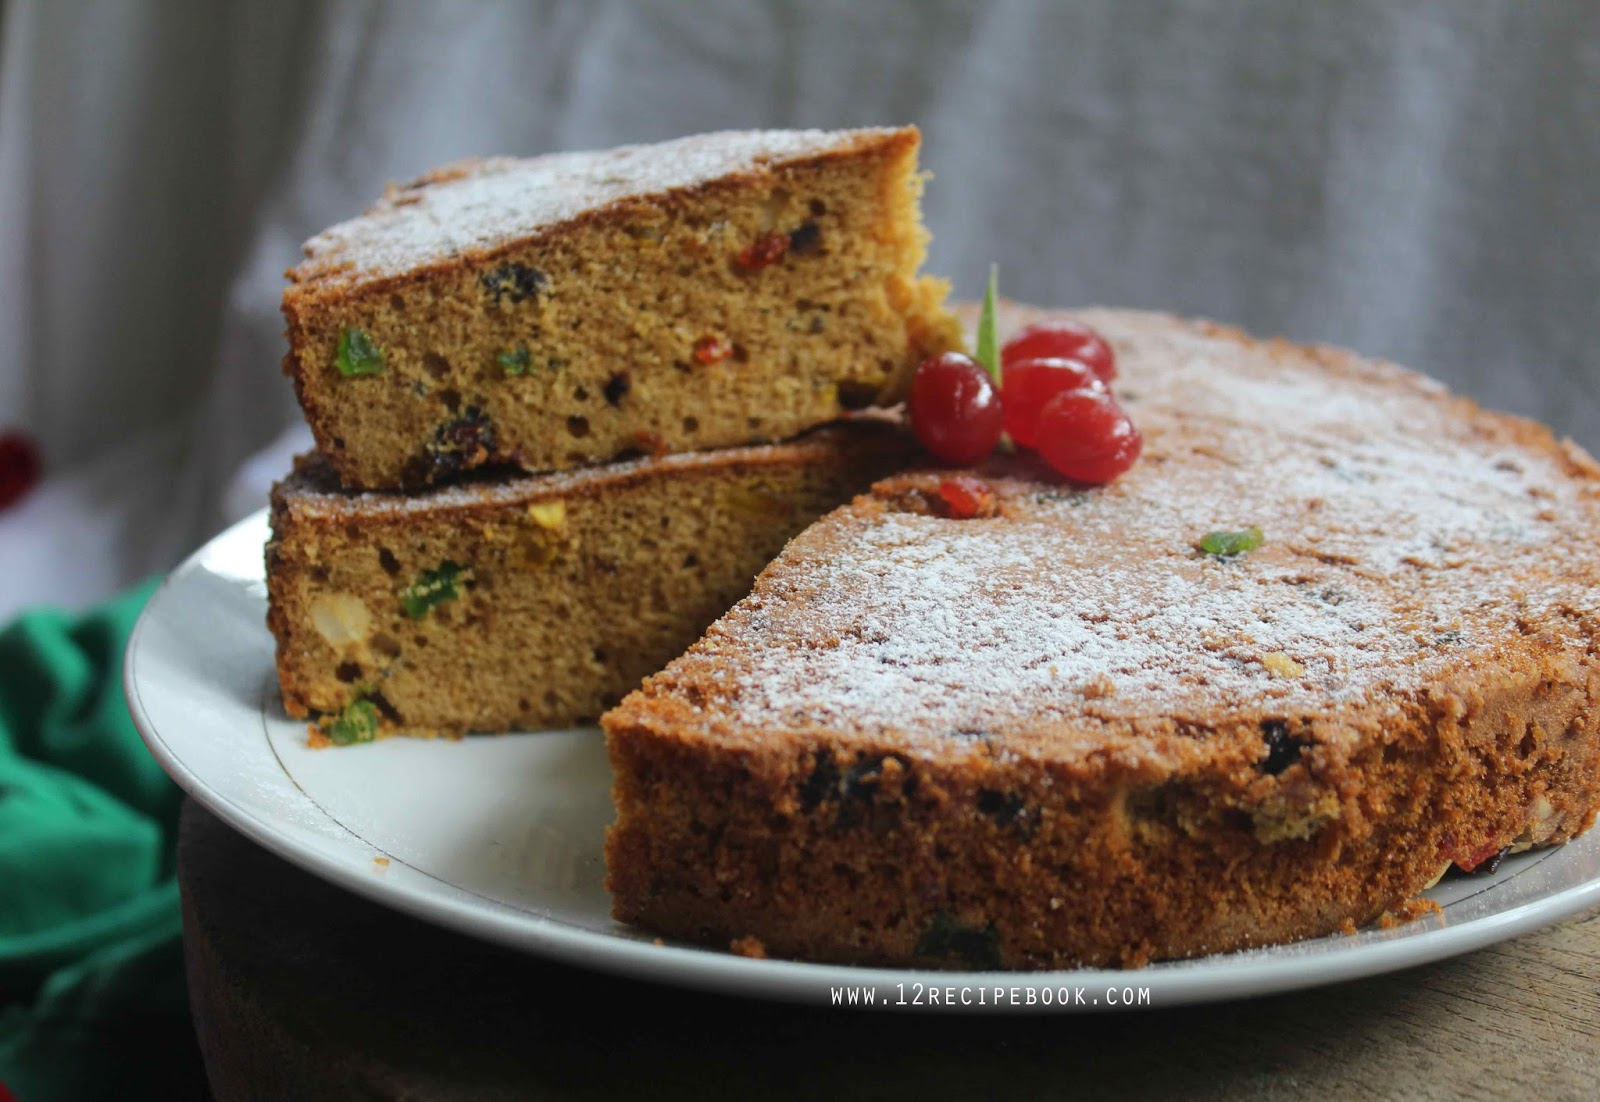 Butterscotch Cake Recipe In Pressure Cooker: Fruit Cake On Pressure Cooker